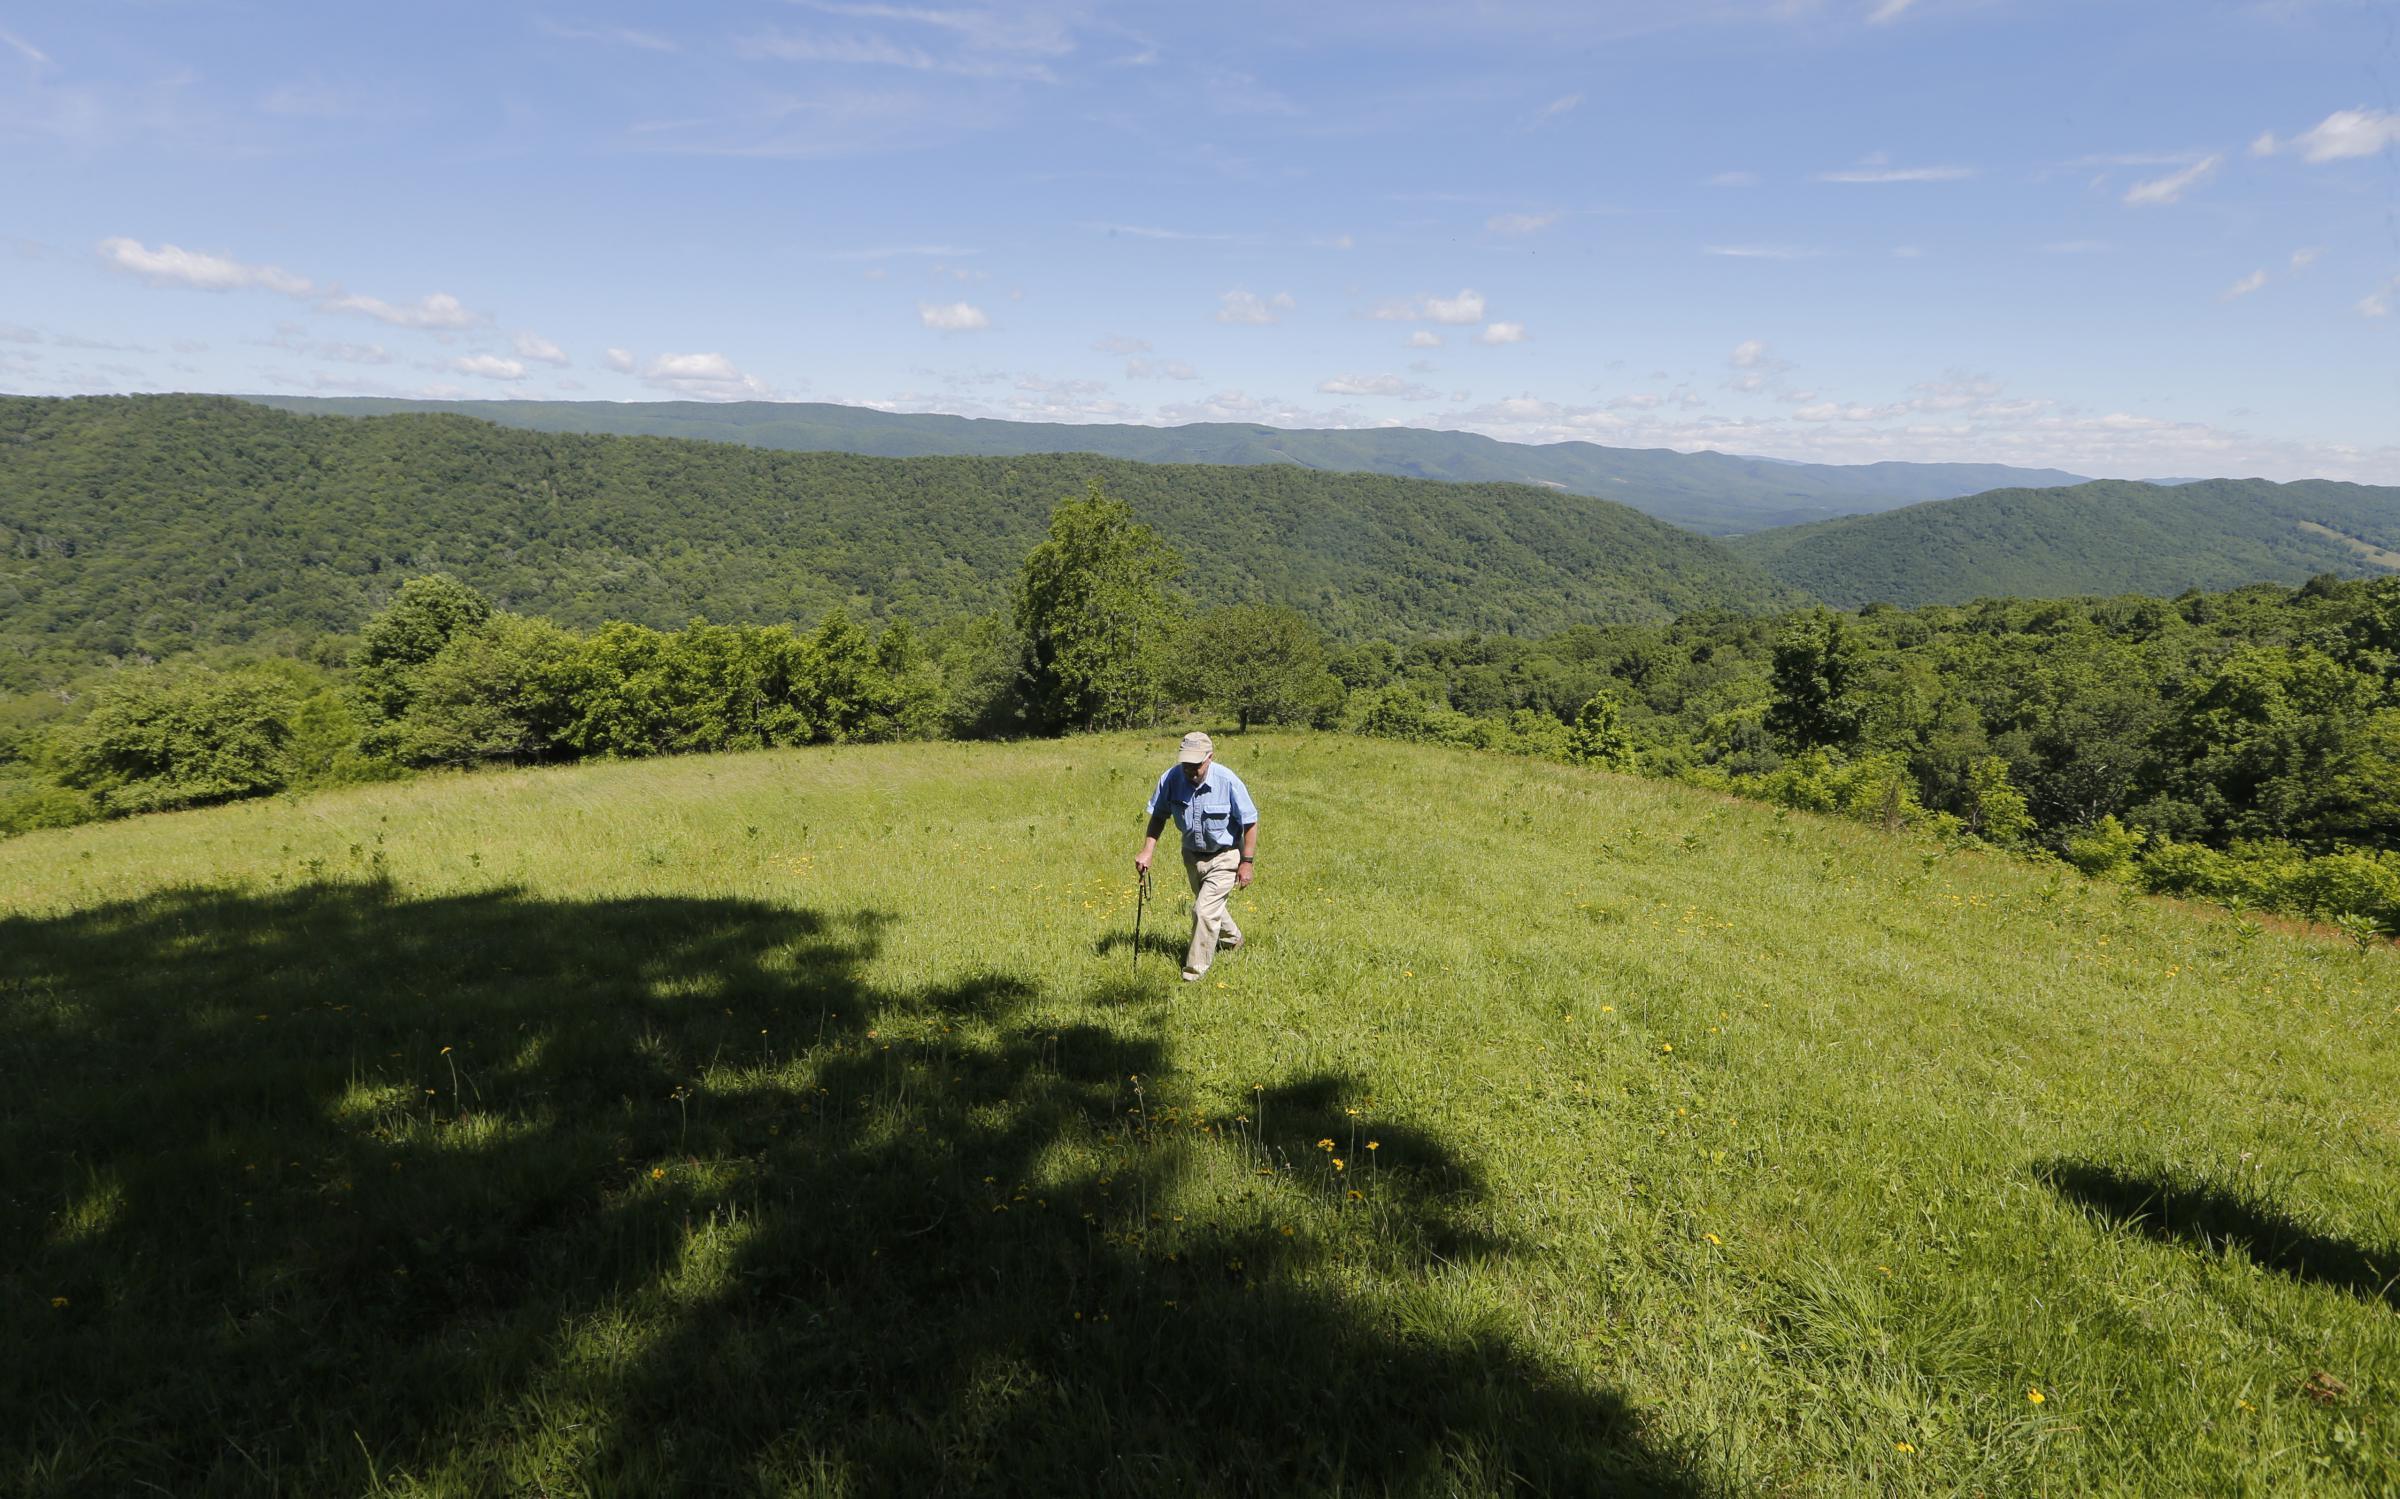 Atlantic Coast Pipeline Seeks Eminent Domain in NC